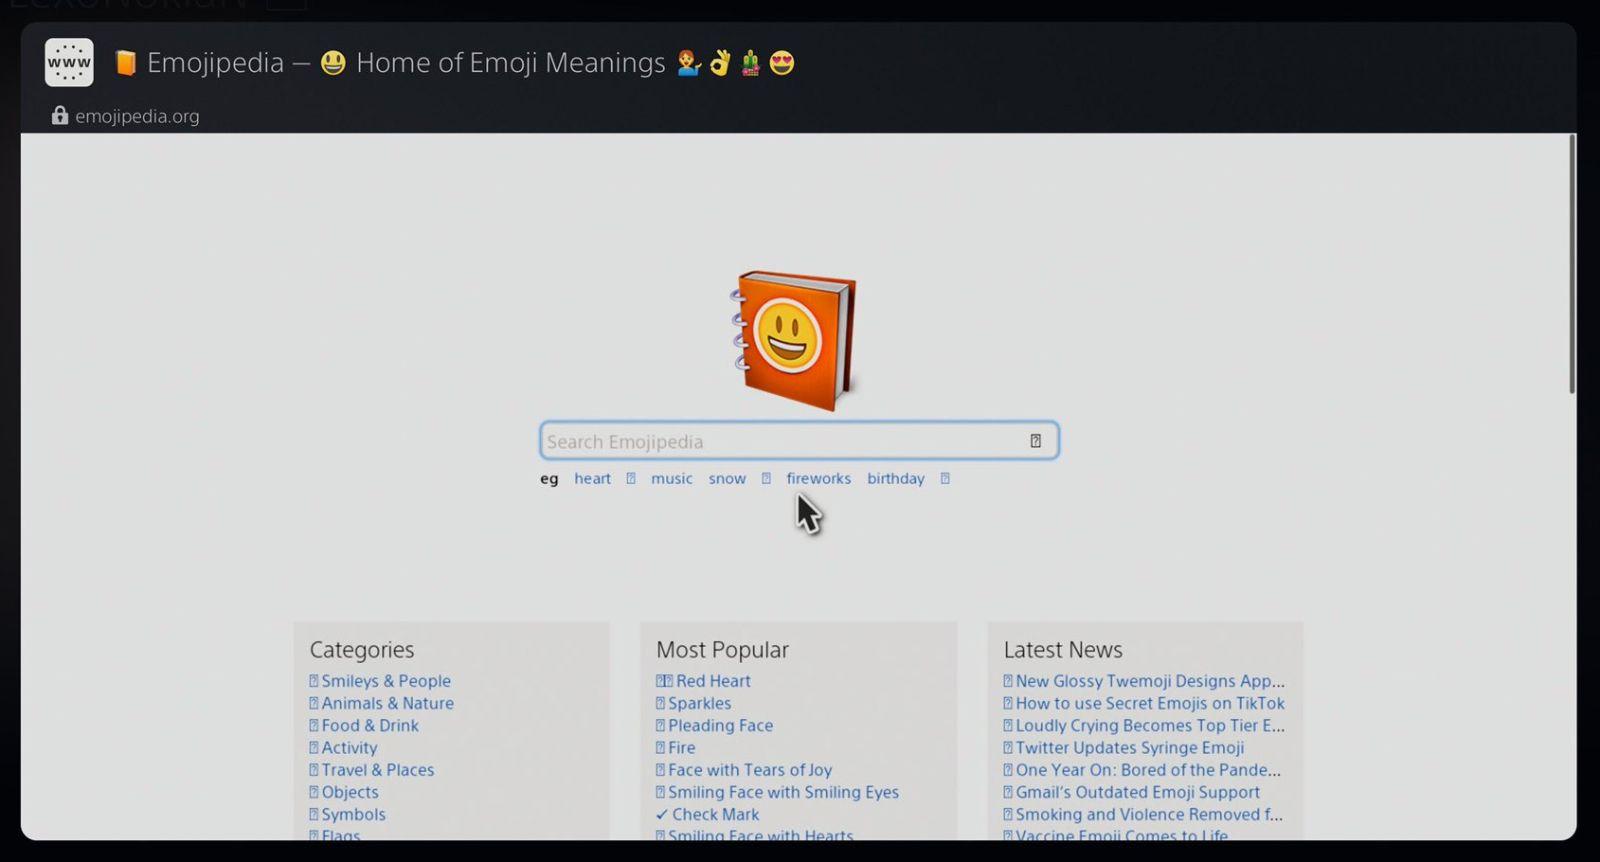 Emojipedia-Playstation-5-Emojipedia-Home-Page